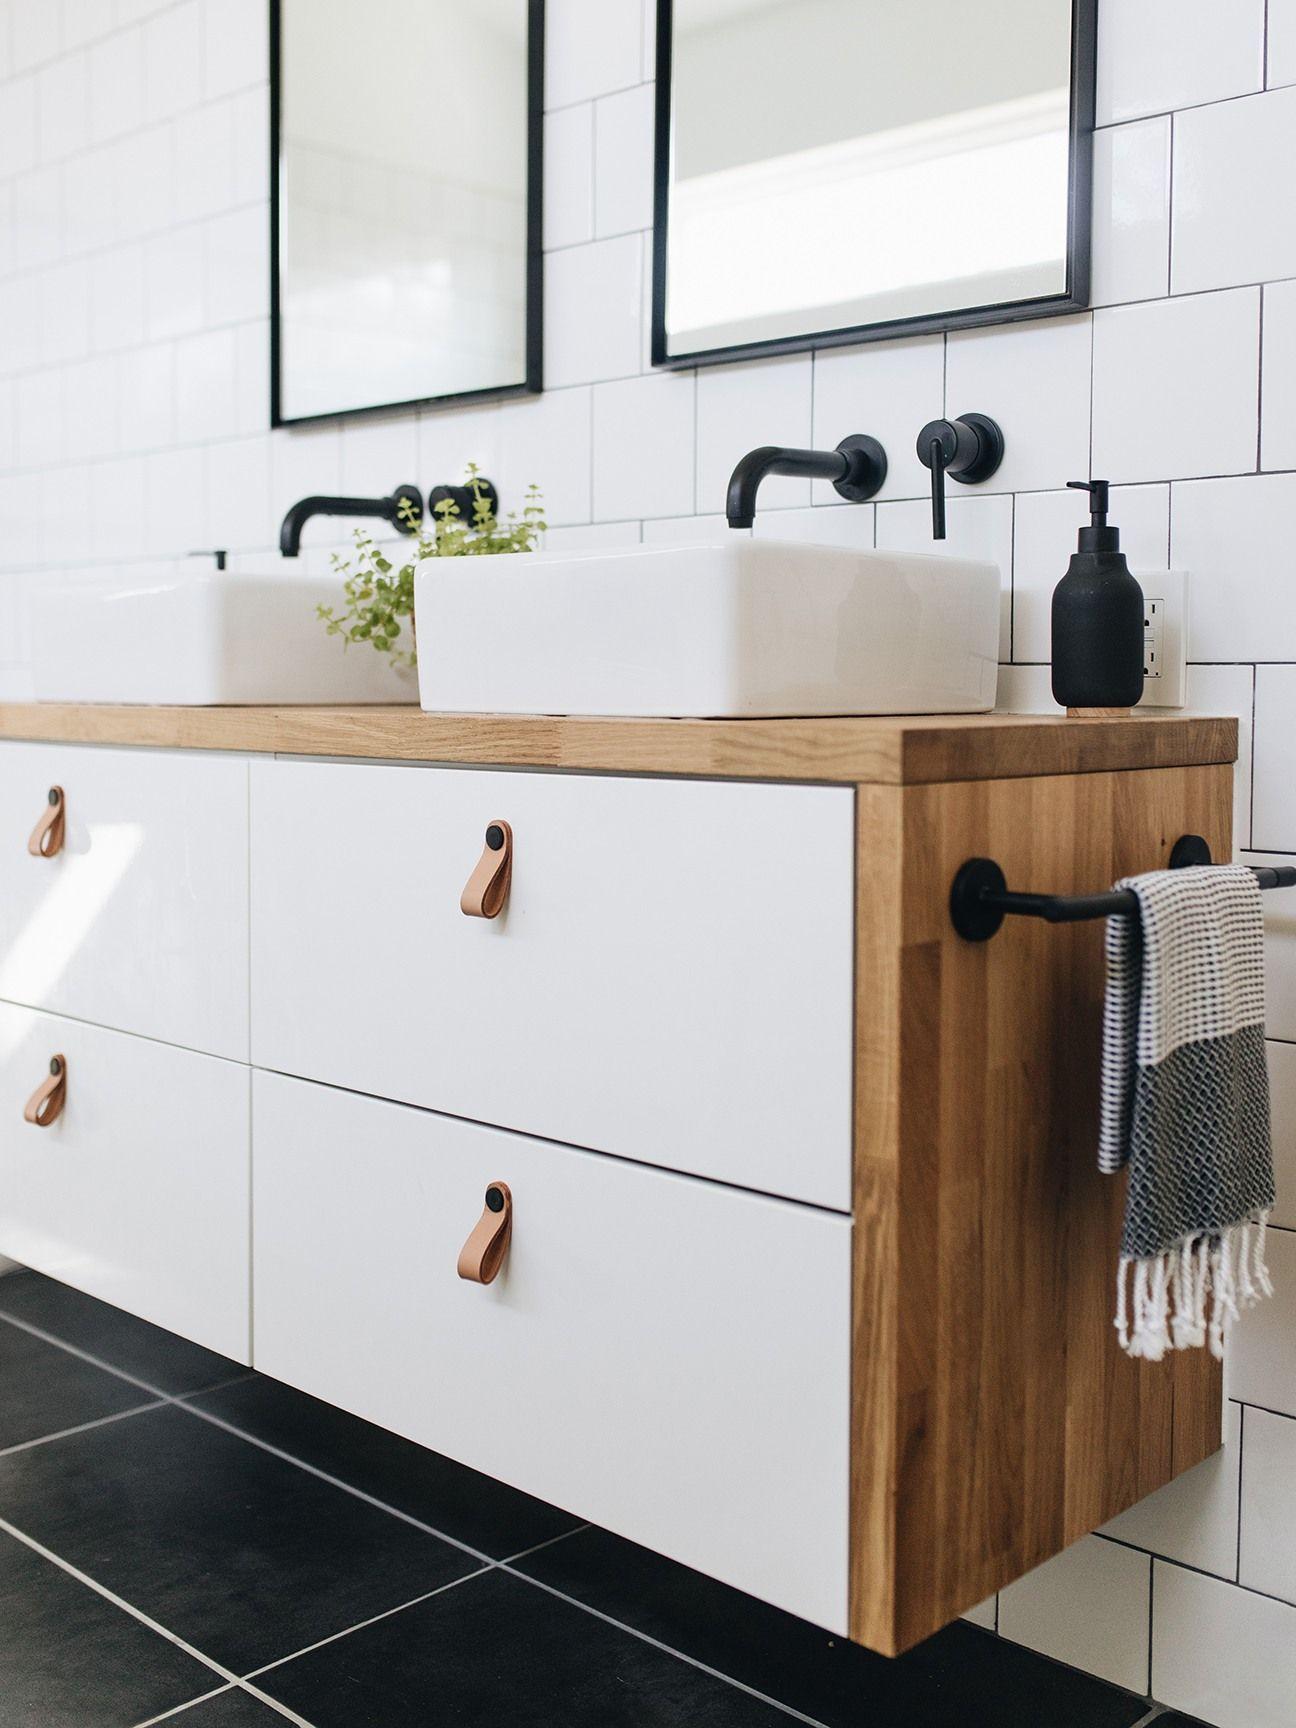 Ausgezeichnete Fotos 10 Ikea Hacks Fur Kleine Badezimmer Strategien En 2020 Bano Ikea Muebles De Bano Mesones